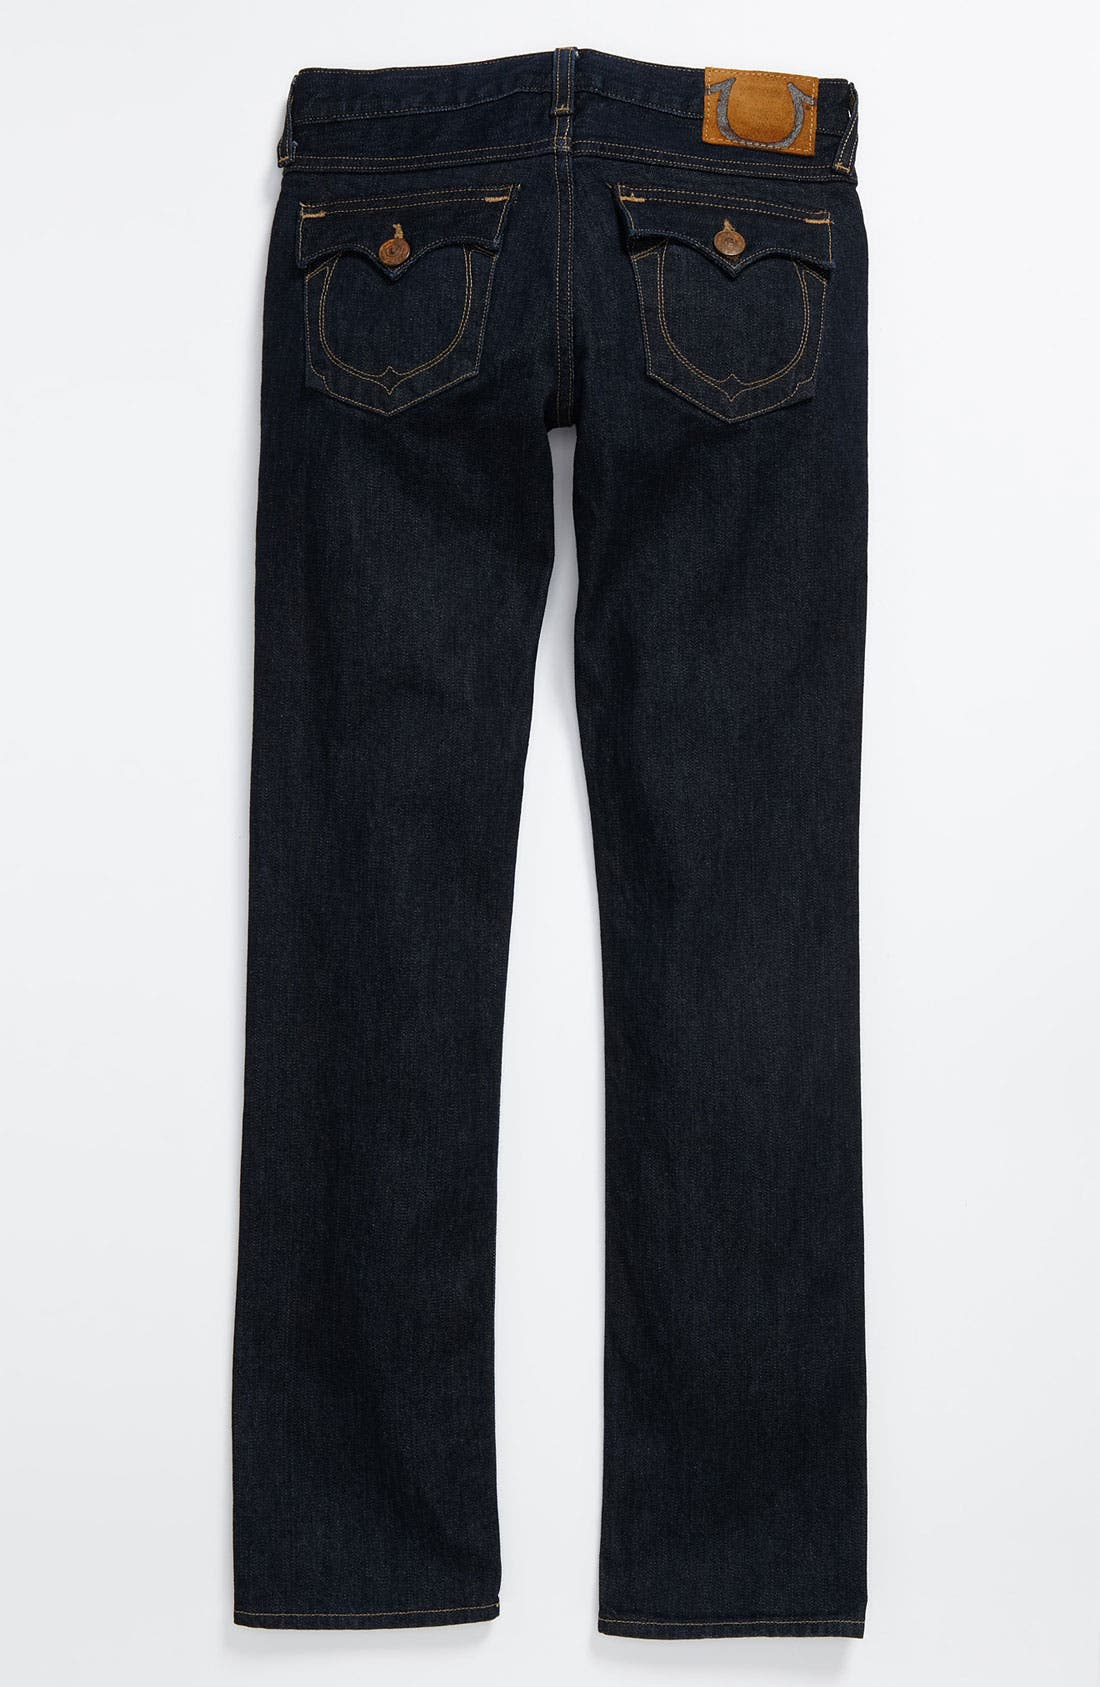 Main Image - True Religion Brand Jeans 'Jack Snake Eyes' Straight Leg Jeans (Big Boys)